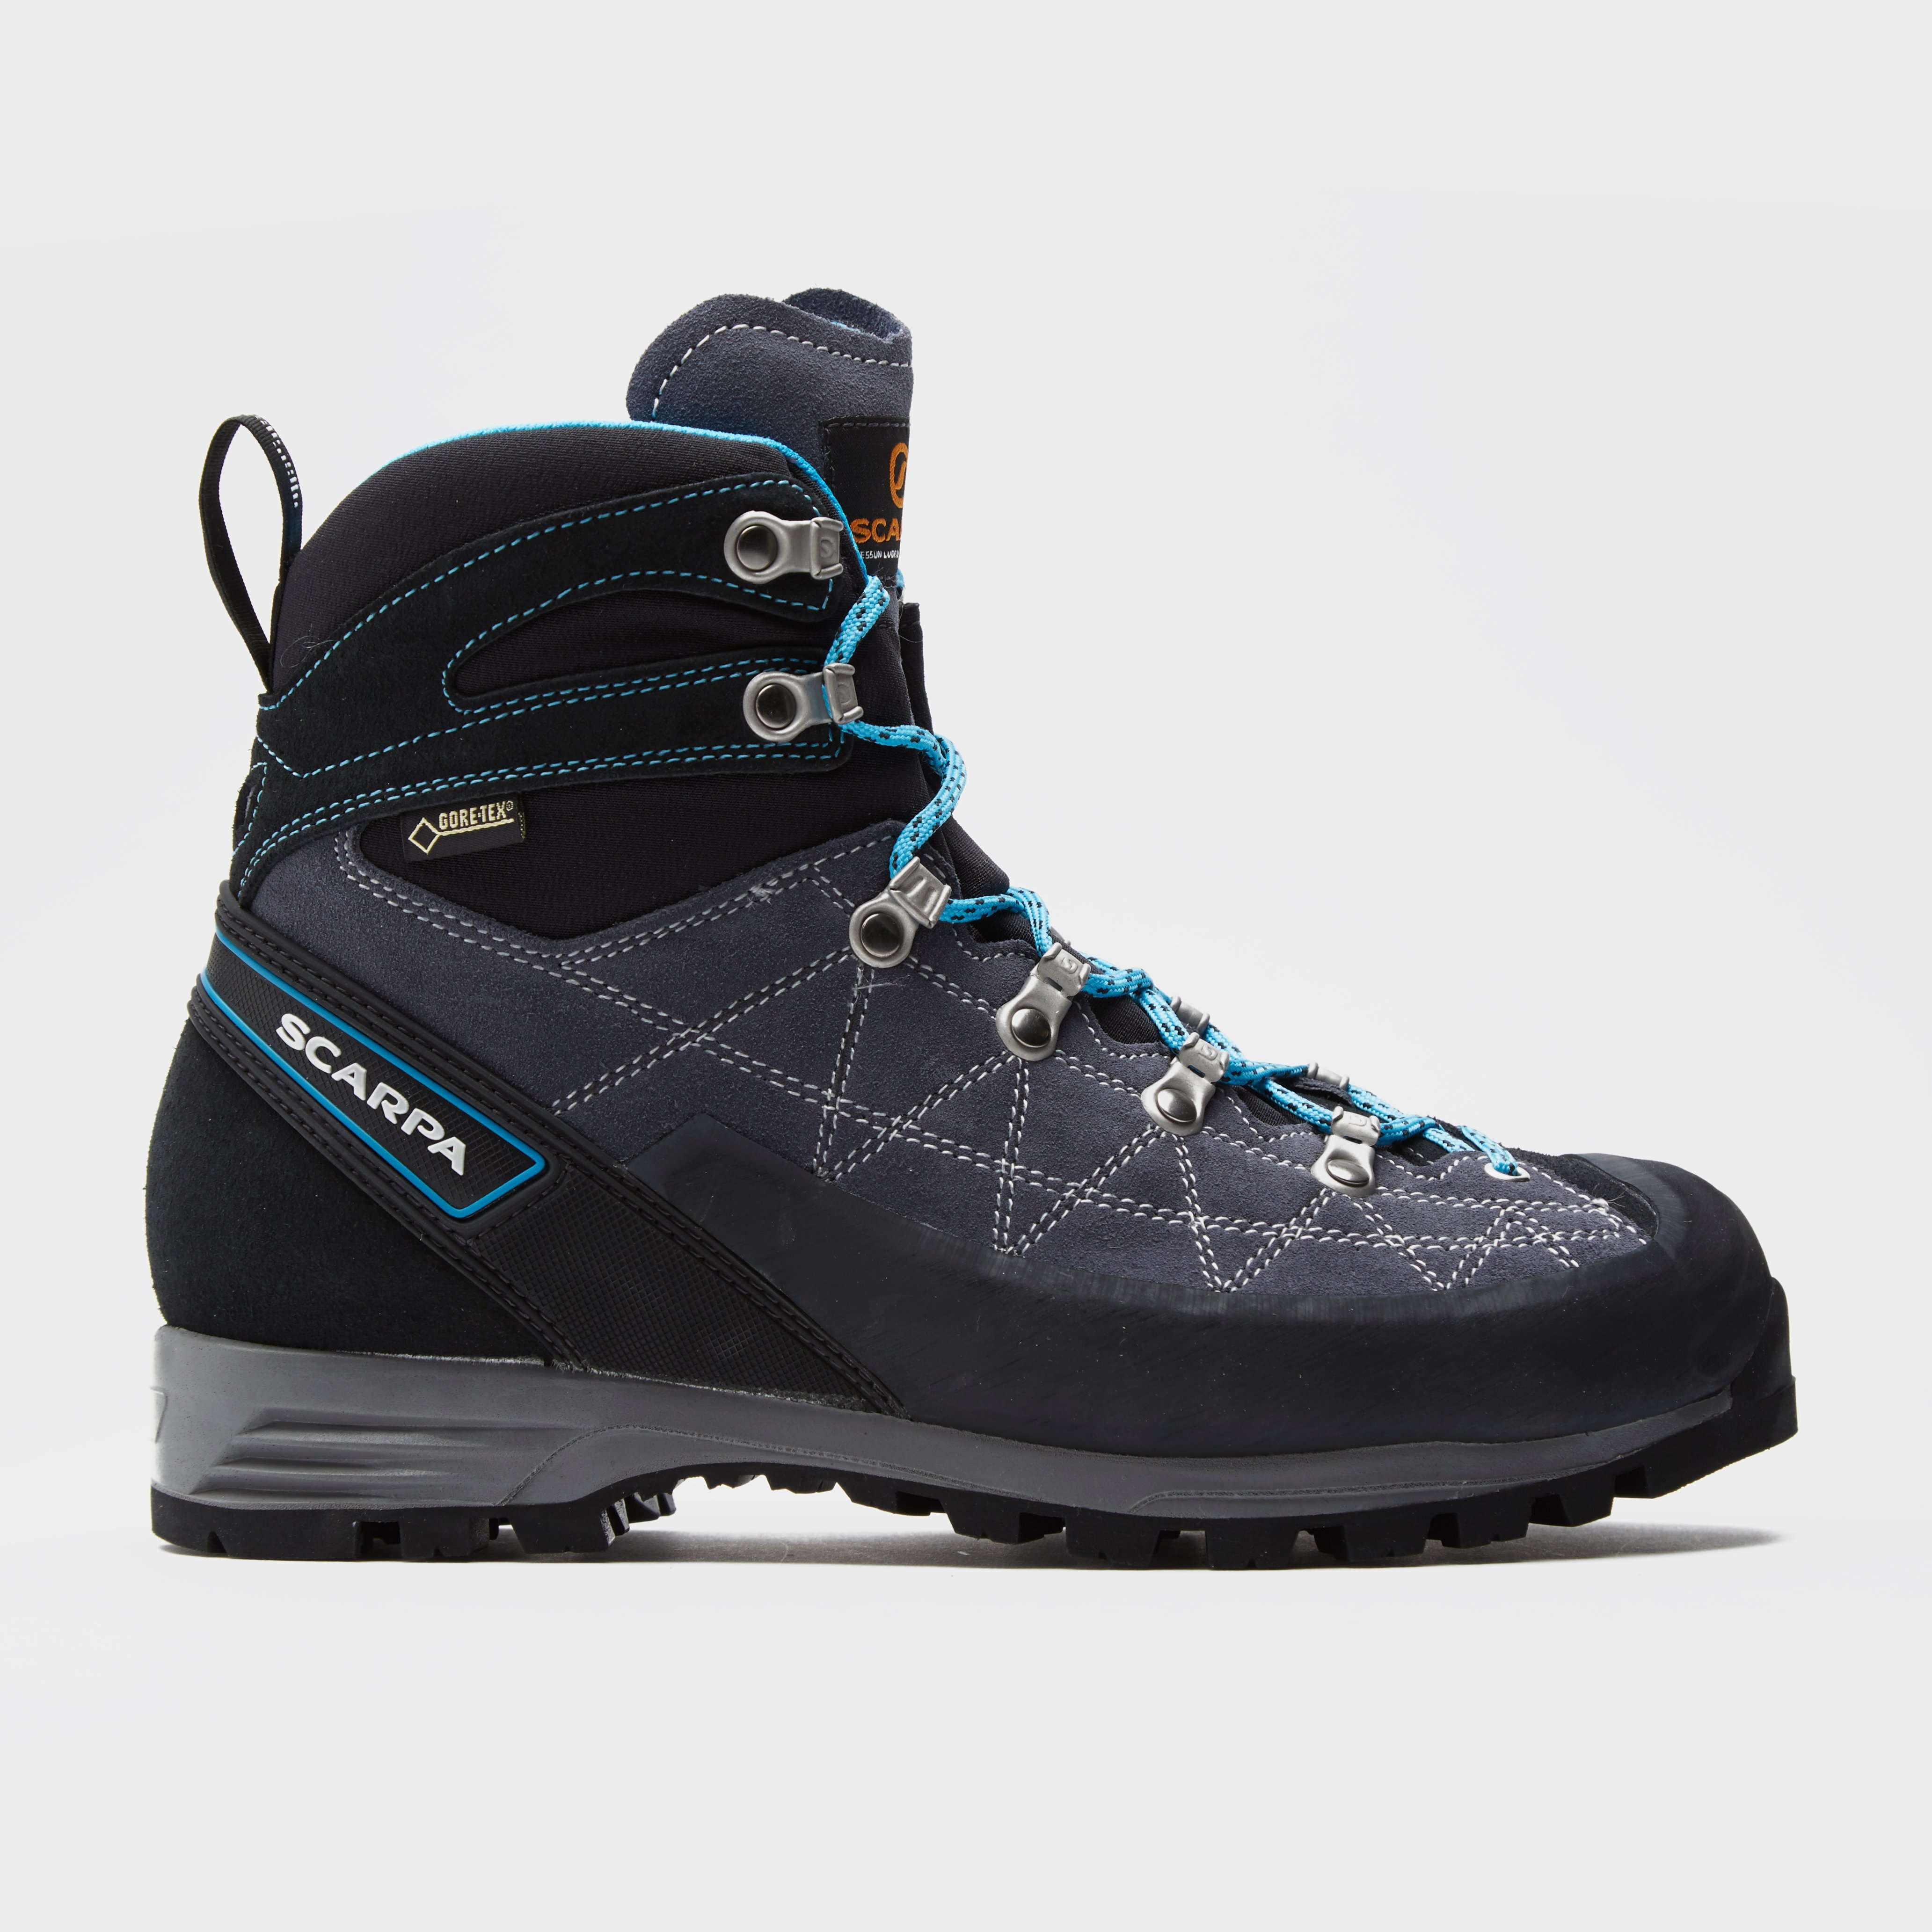 SCARPA Women's R-Evolution Pro GORE-TEX® Trekking Boot